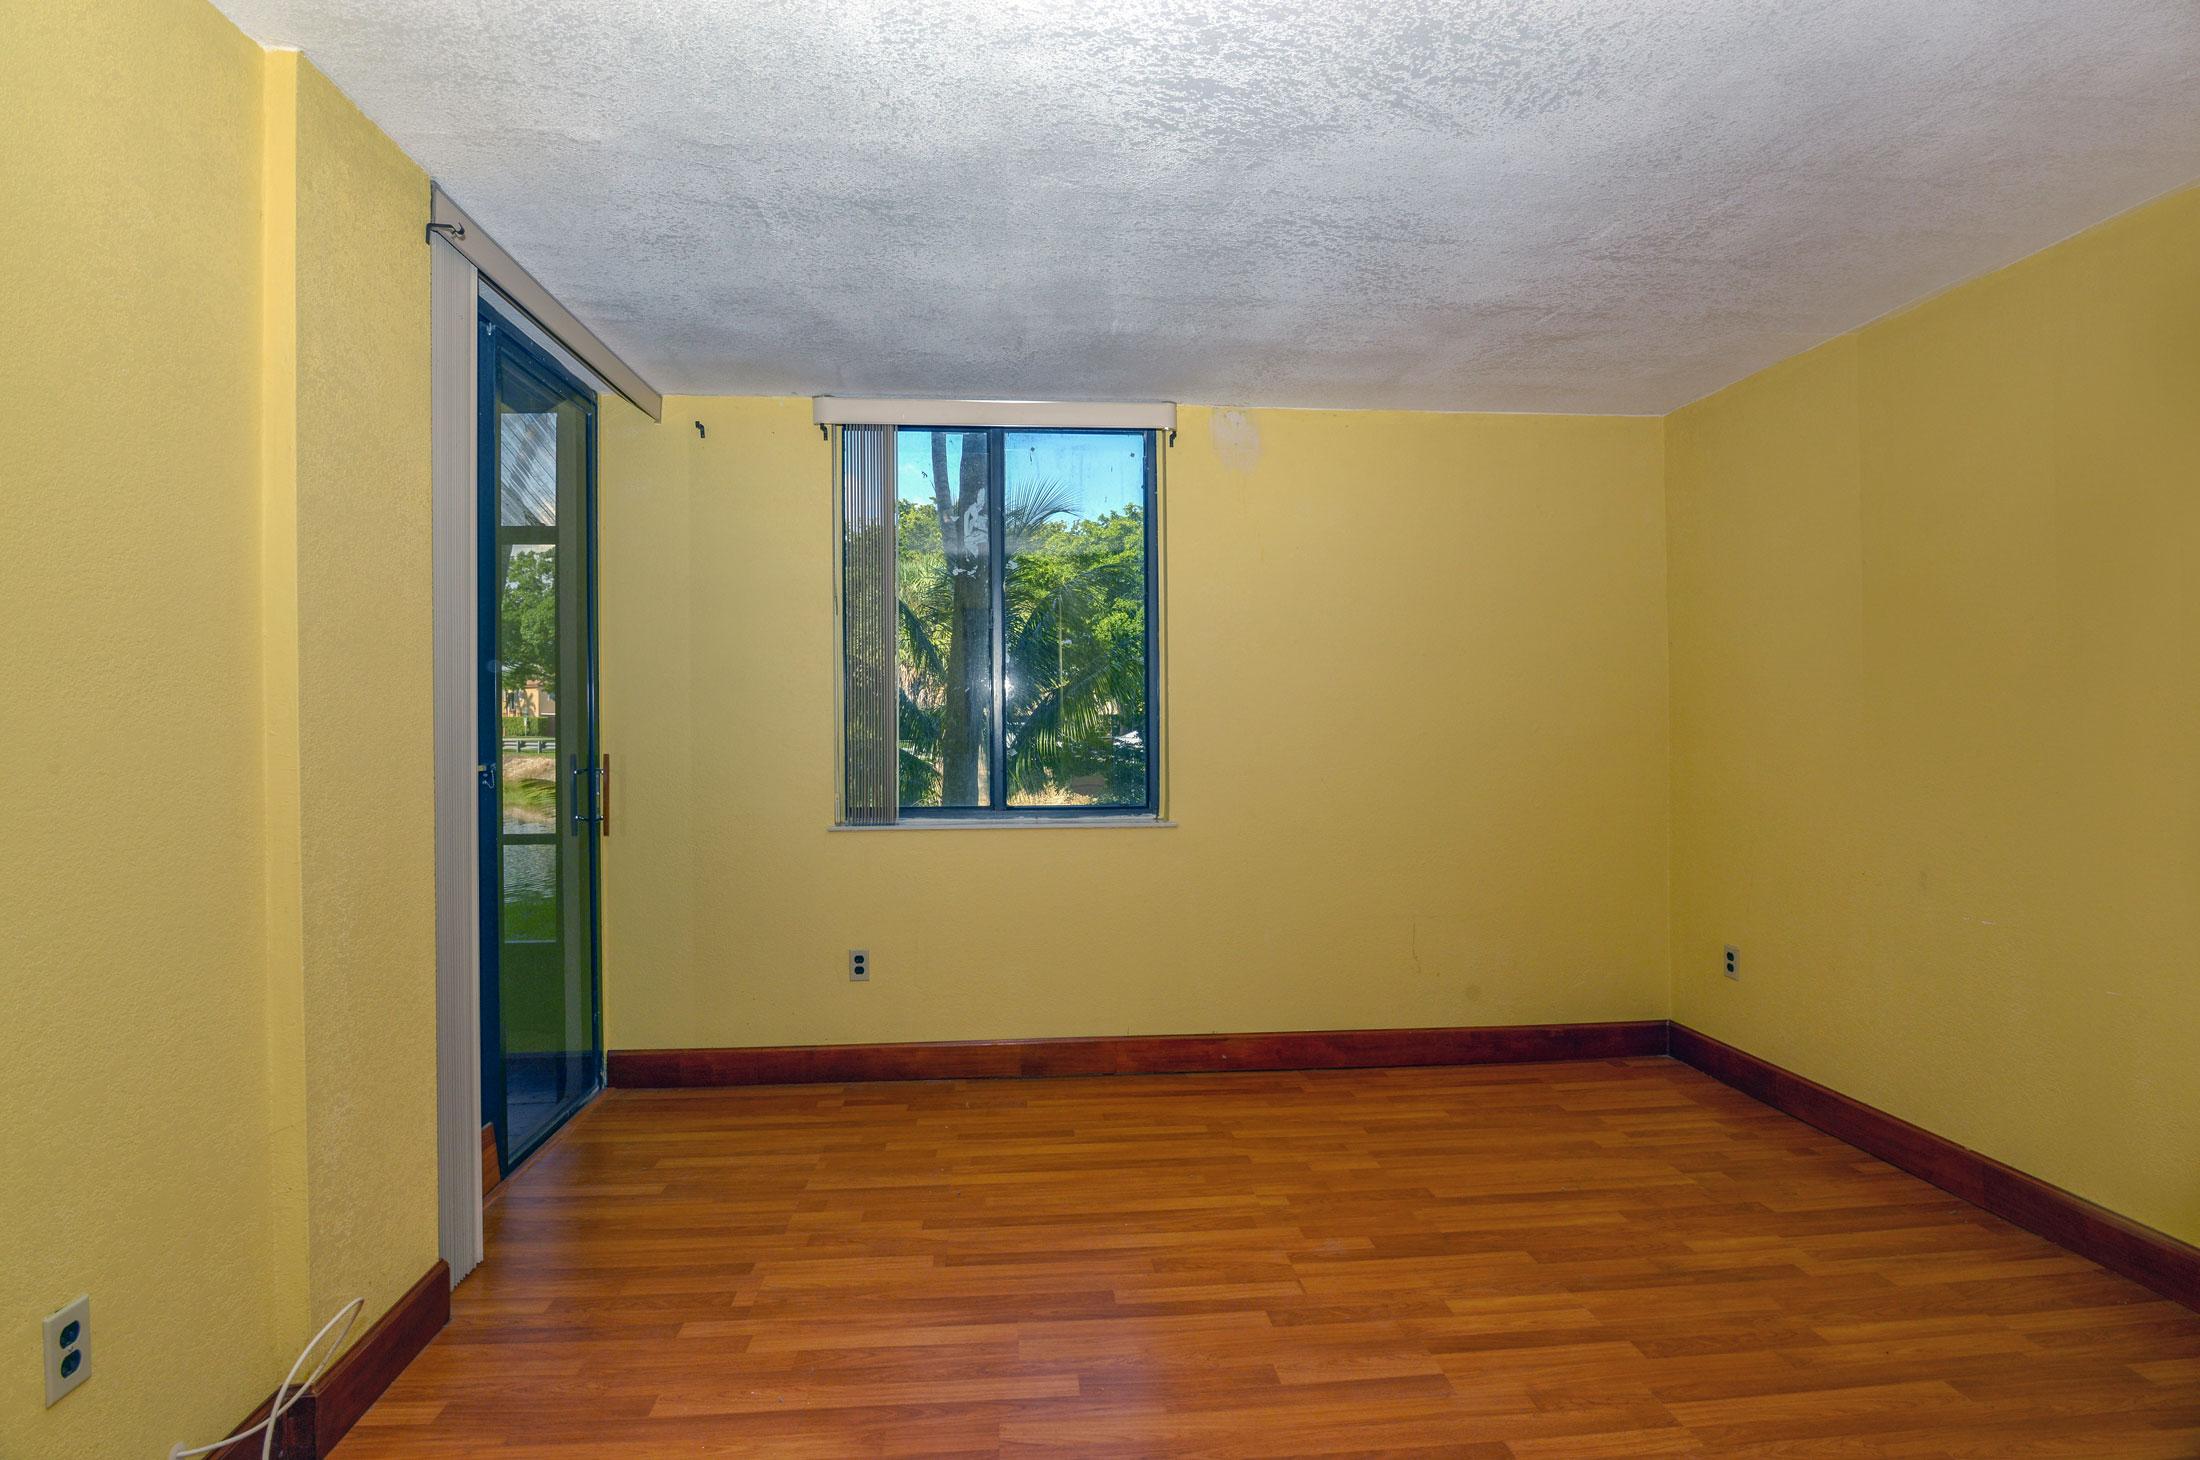 8305 SW 152nd Ave, A-109, Miami FL 33193-8